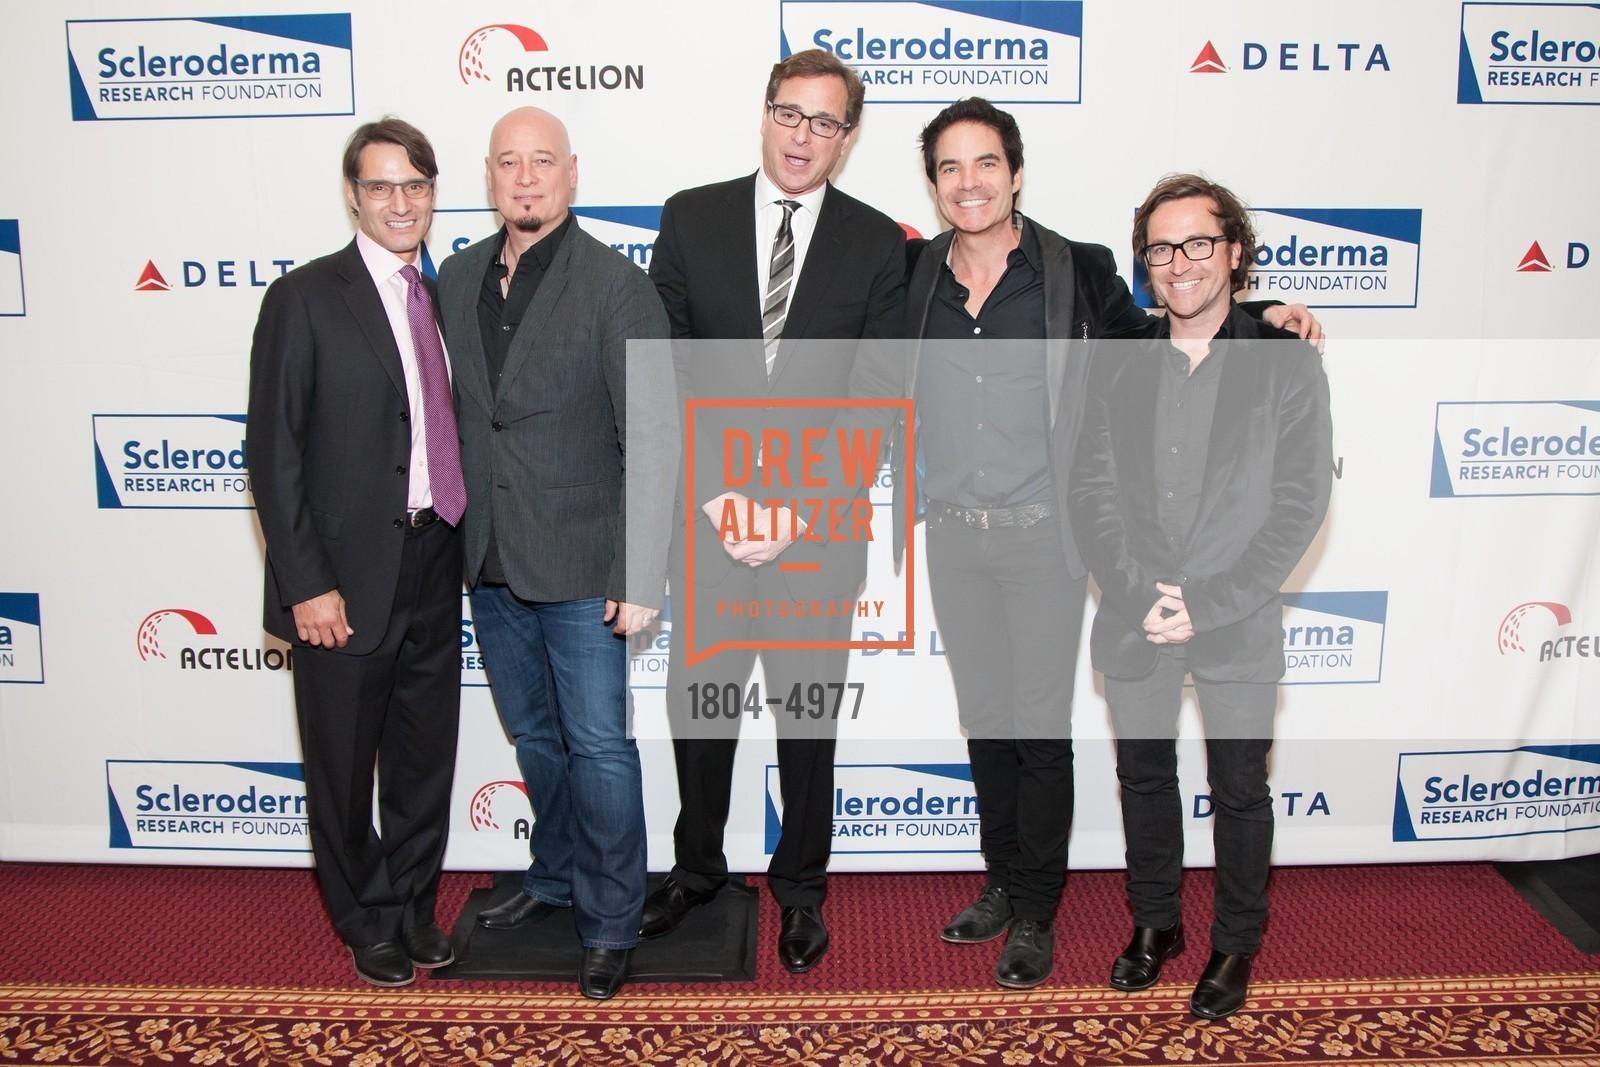 Luke Evnin, Jimmy Stafford, Bob Saget, Pat Monahan, Jerry Becker, Photo #1804-4977